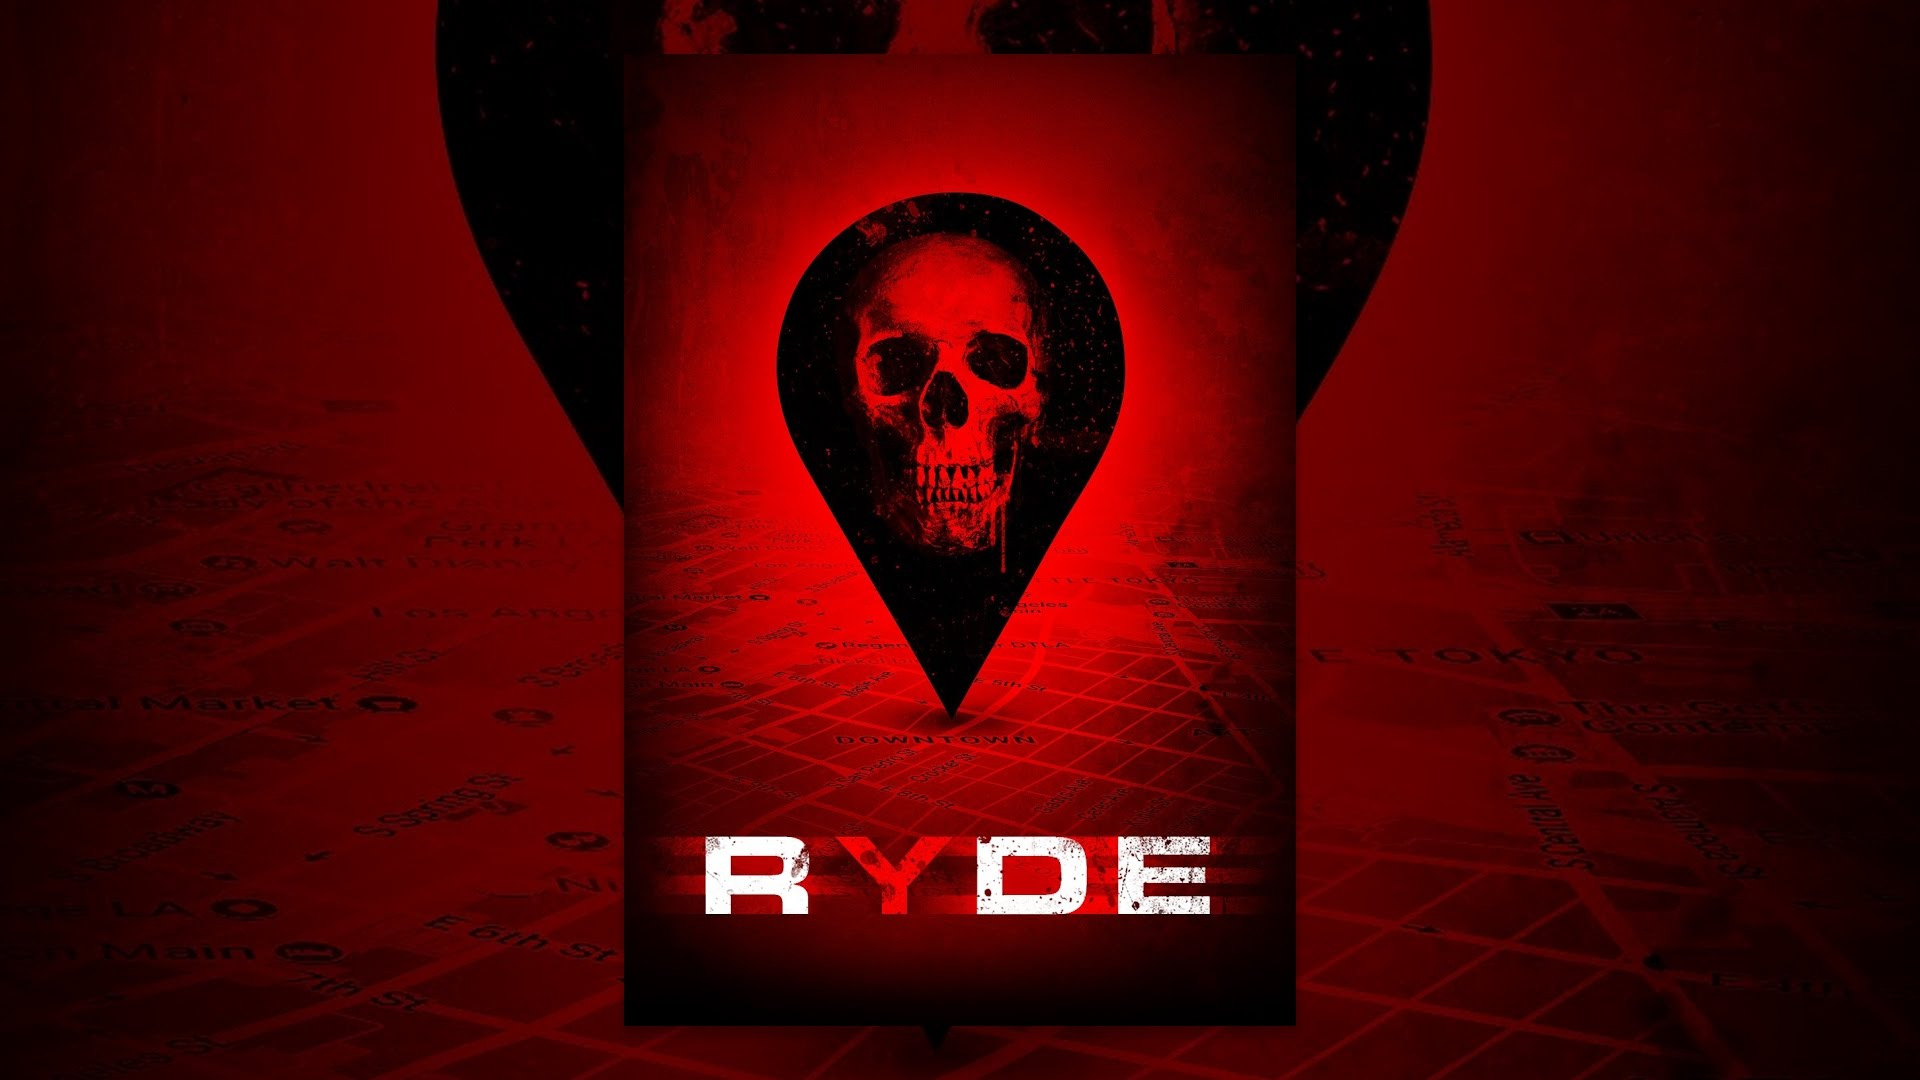 [VIDEO] - Ryde 1